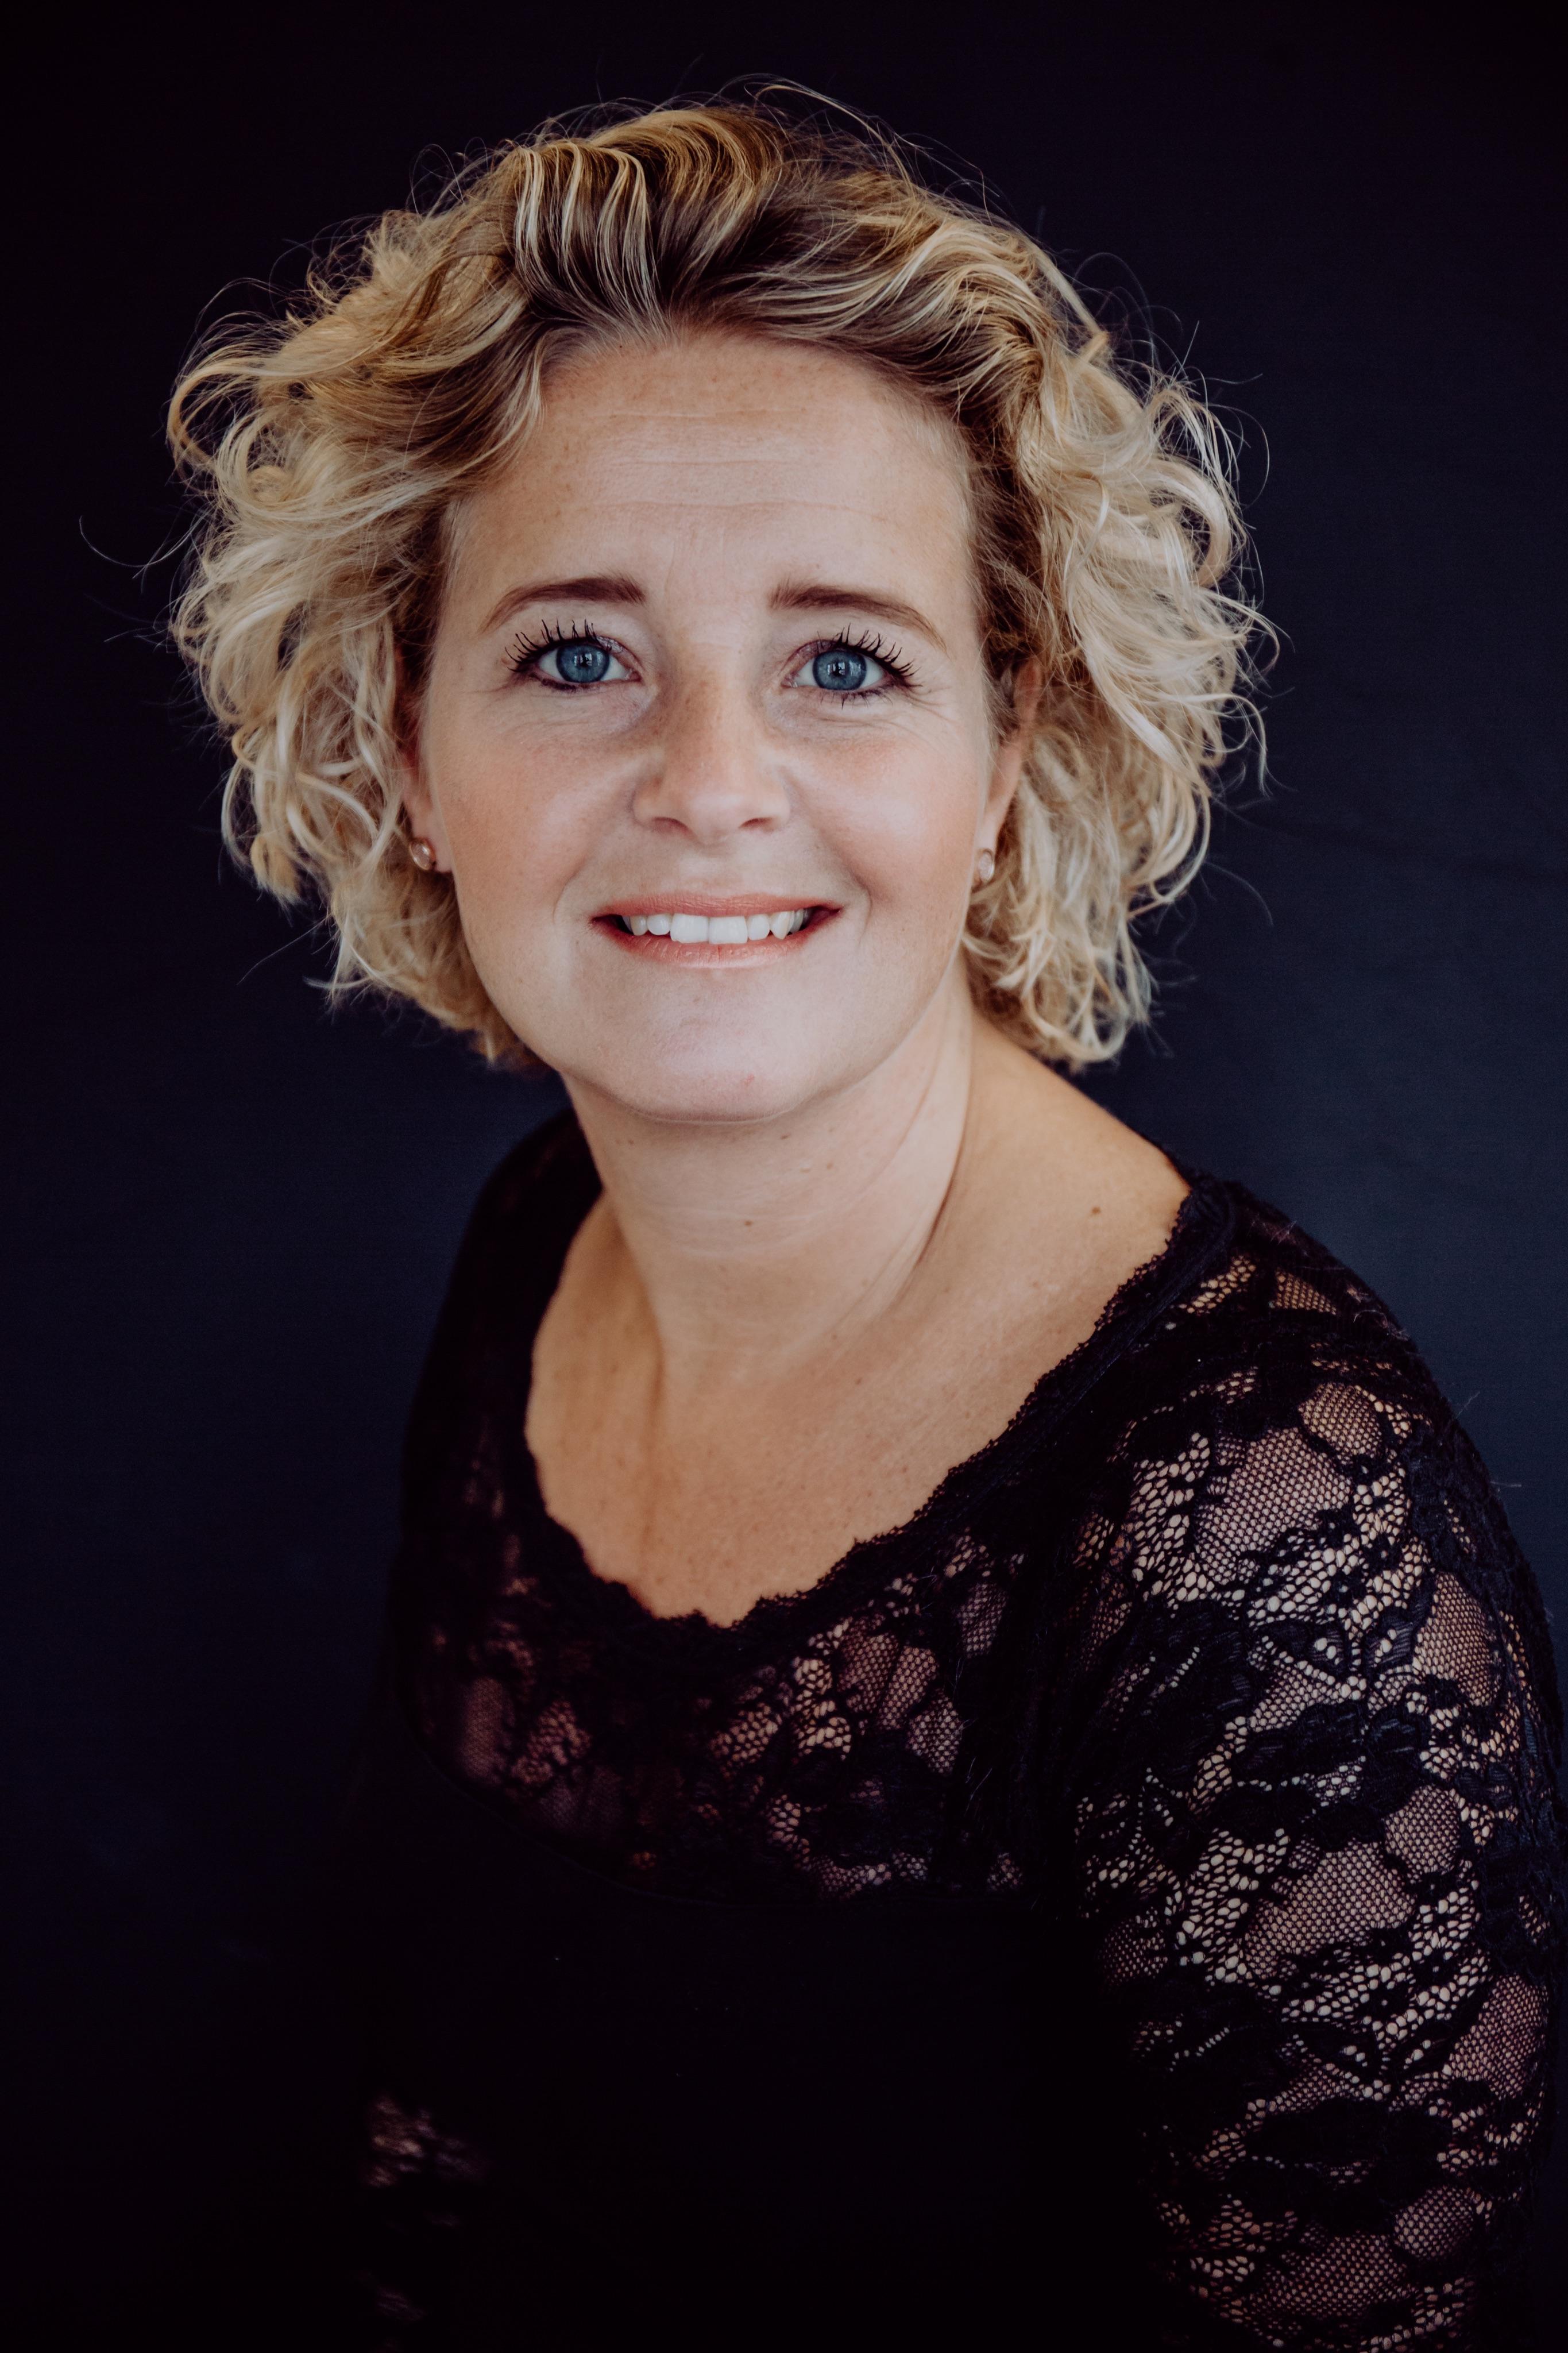 Maartje - Kapper bij Kapsalon Wim Brandjes Heemskerk